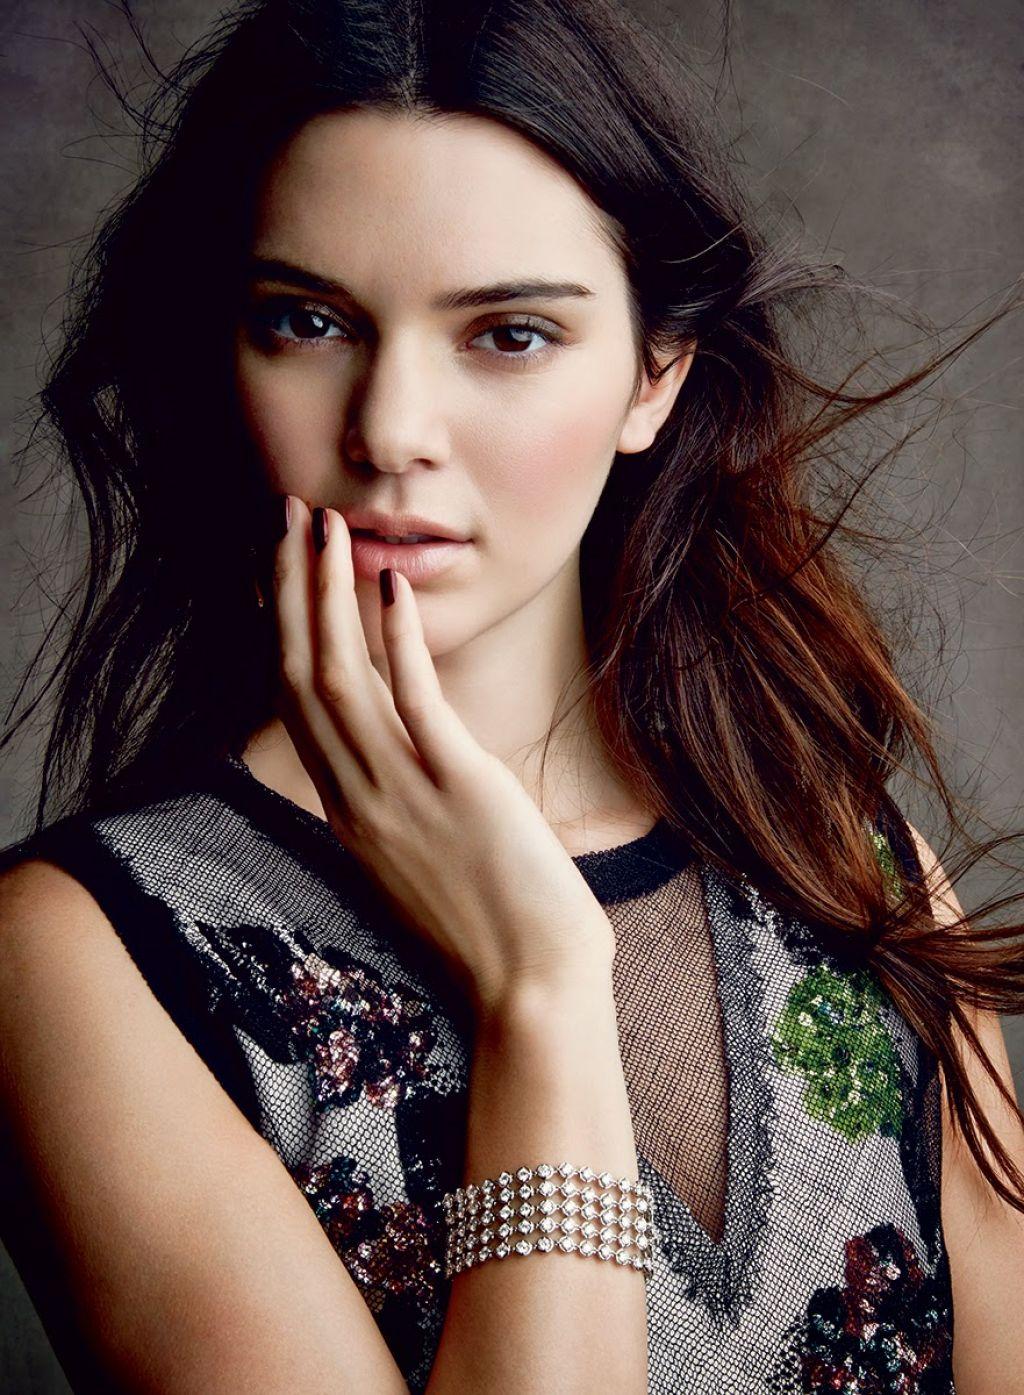 Kendall Jenner Photoshot For Vogue Magazine (US) December 2014